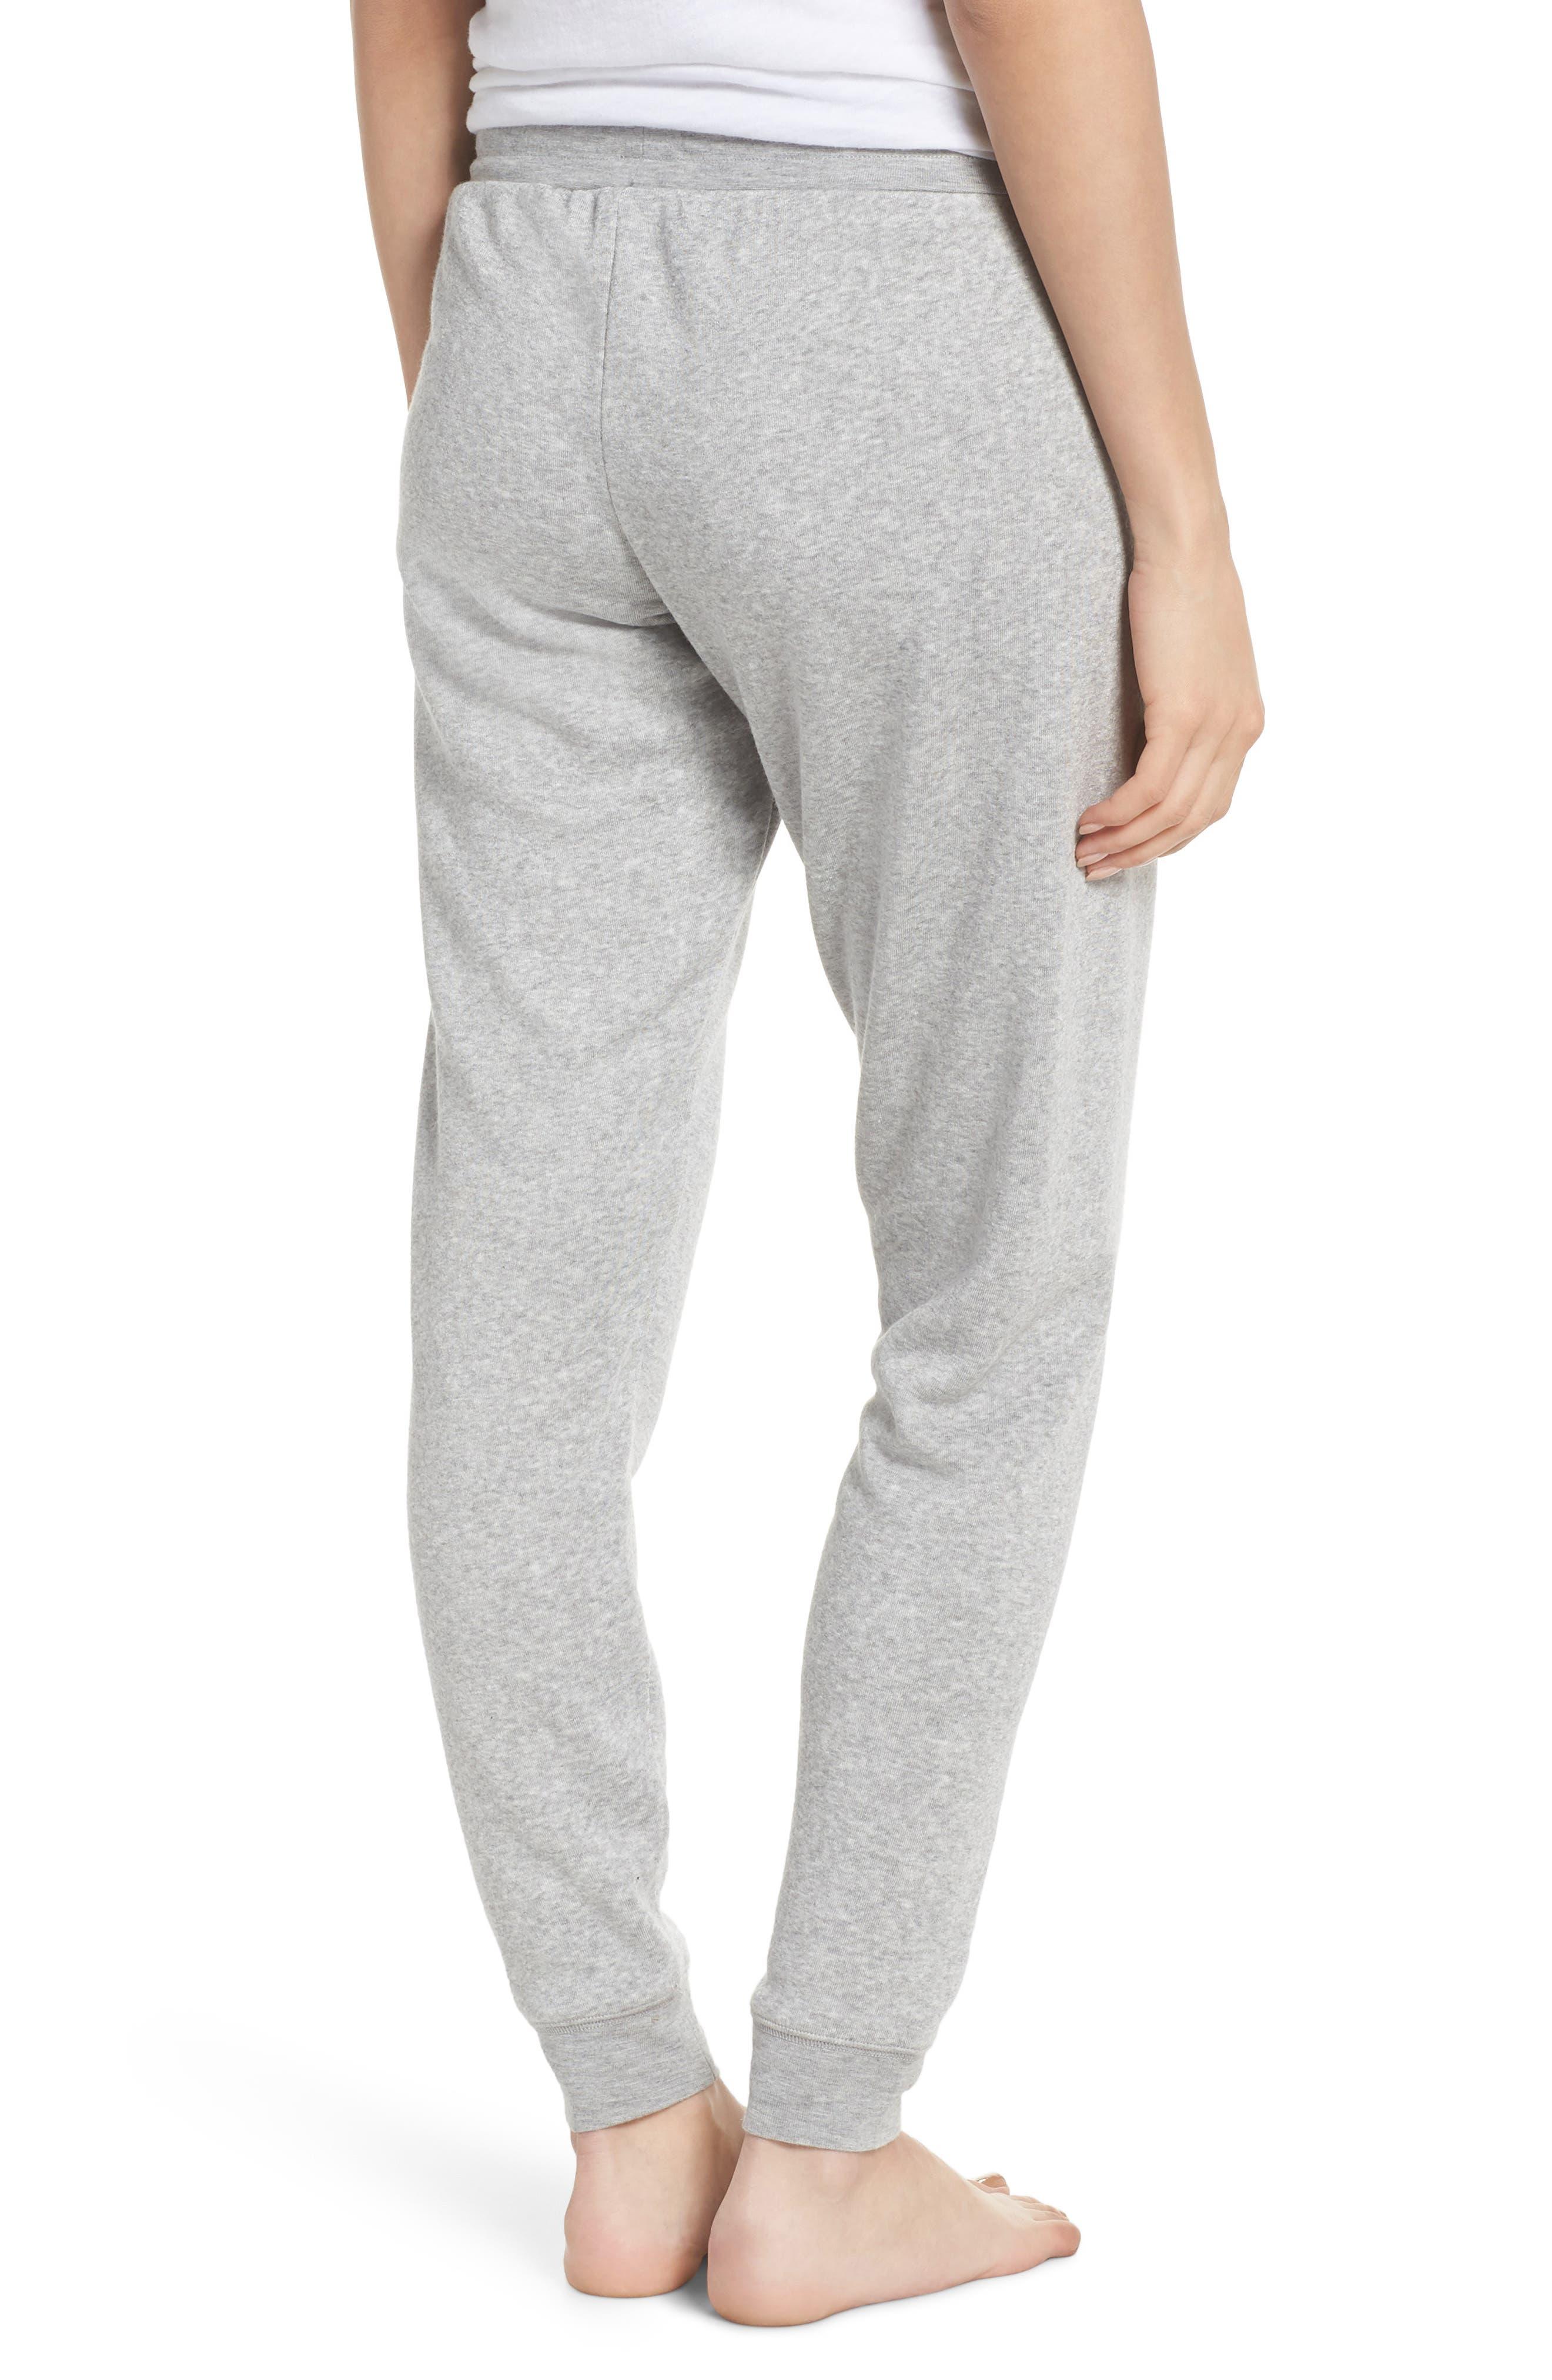 Firecracker Jogger Pajama Pants,                             Alternate thumbnail 2, color,                             021